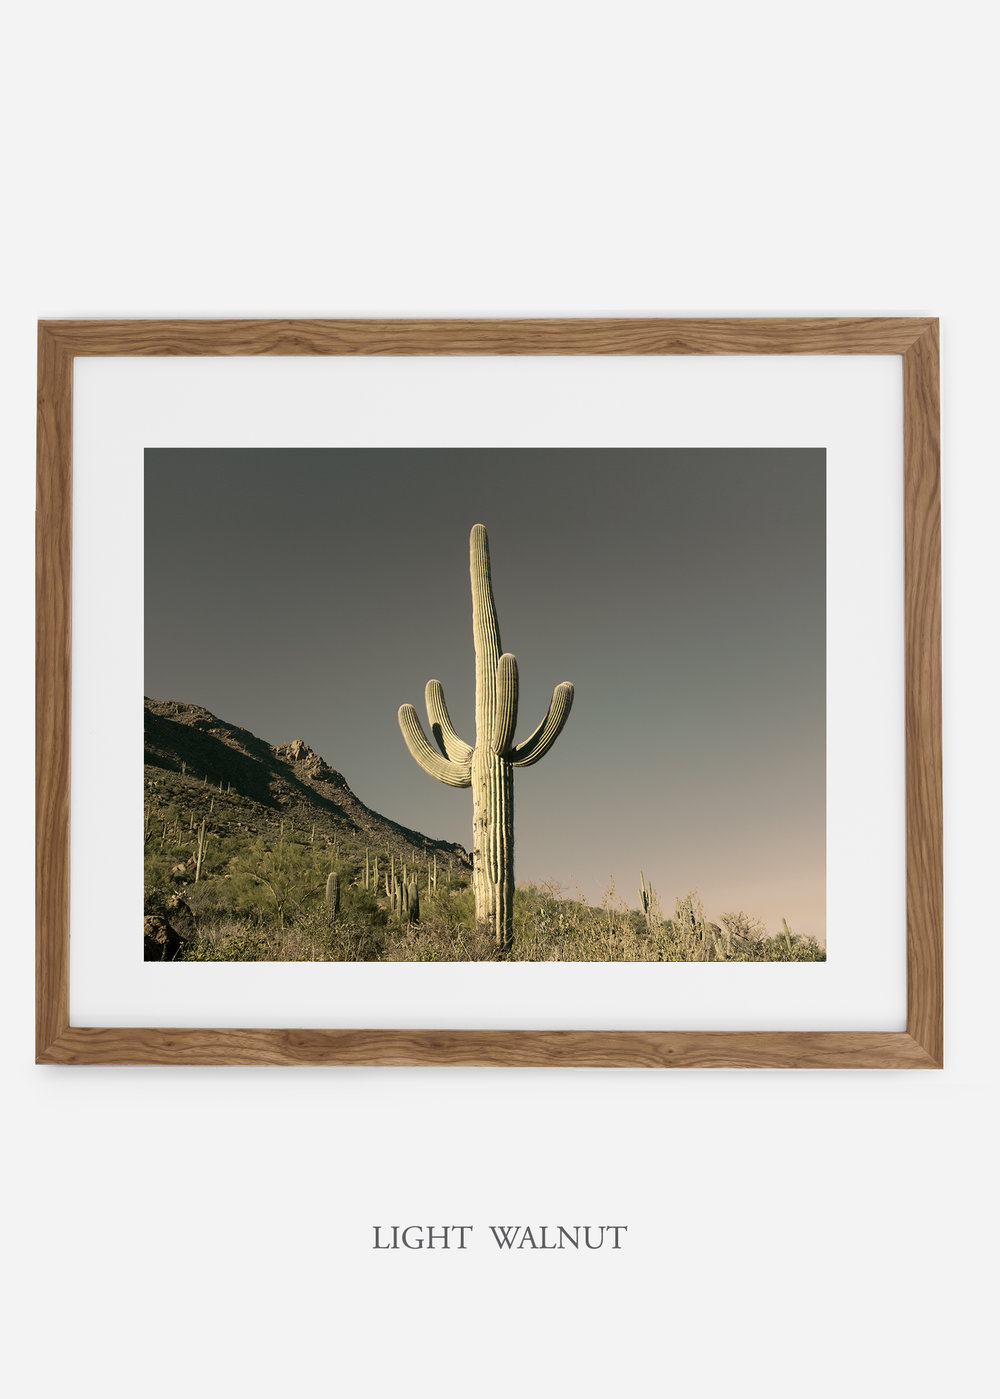 lightwalnutframe-saguaroNo.19-wildercalifornia-art-wallart-cactusprint-homedecor-prints-arizona-botanical-artwork-interiordesign.jpg